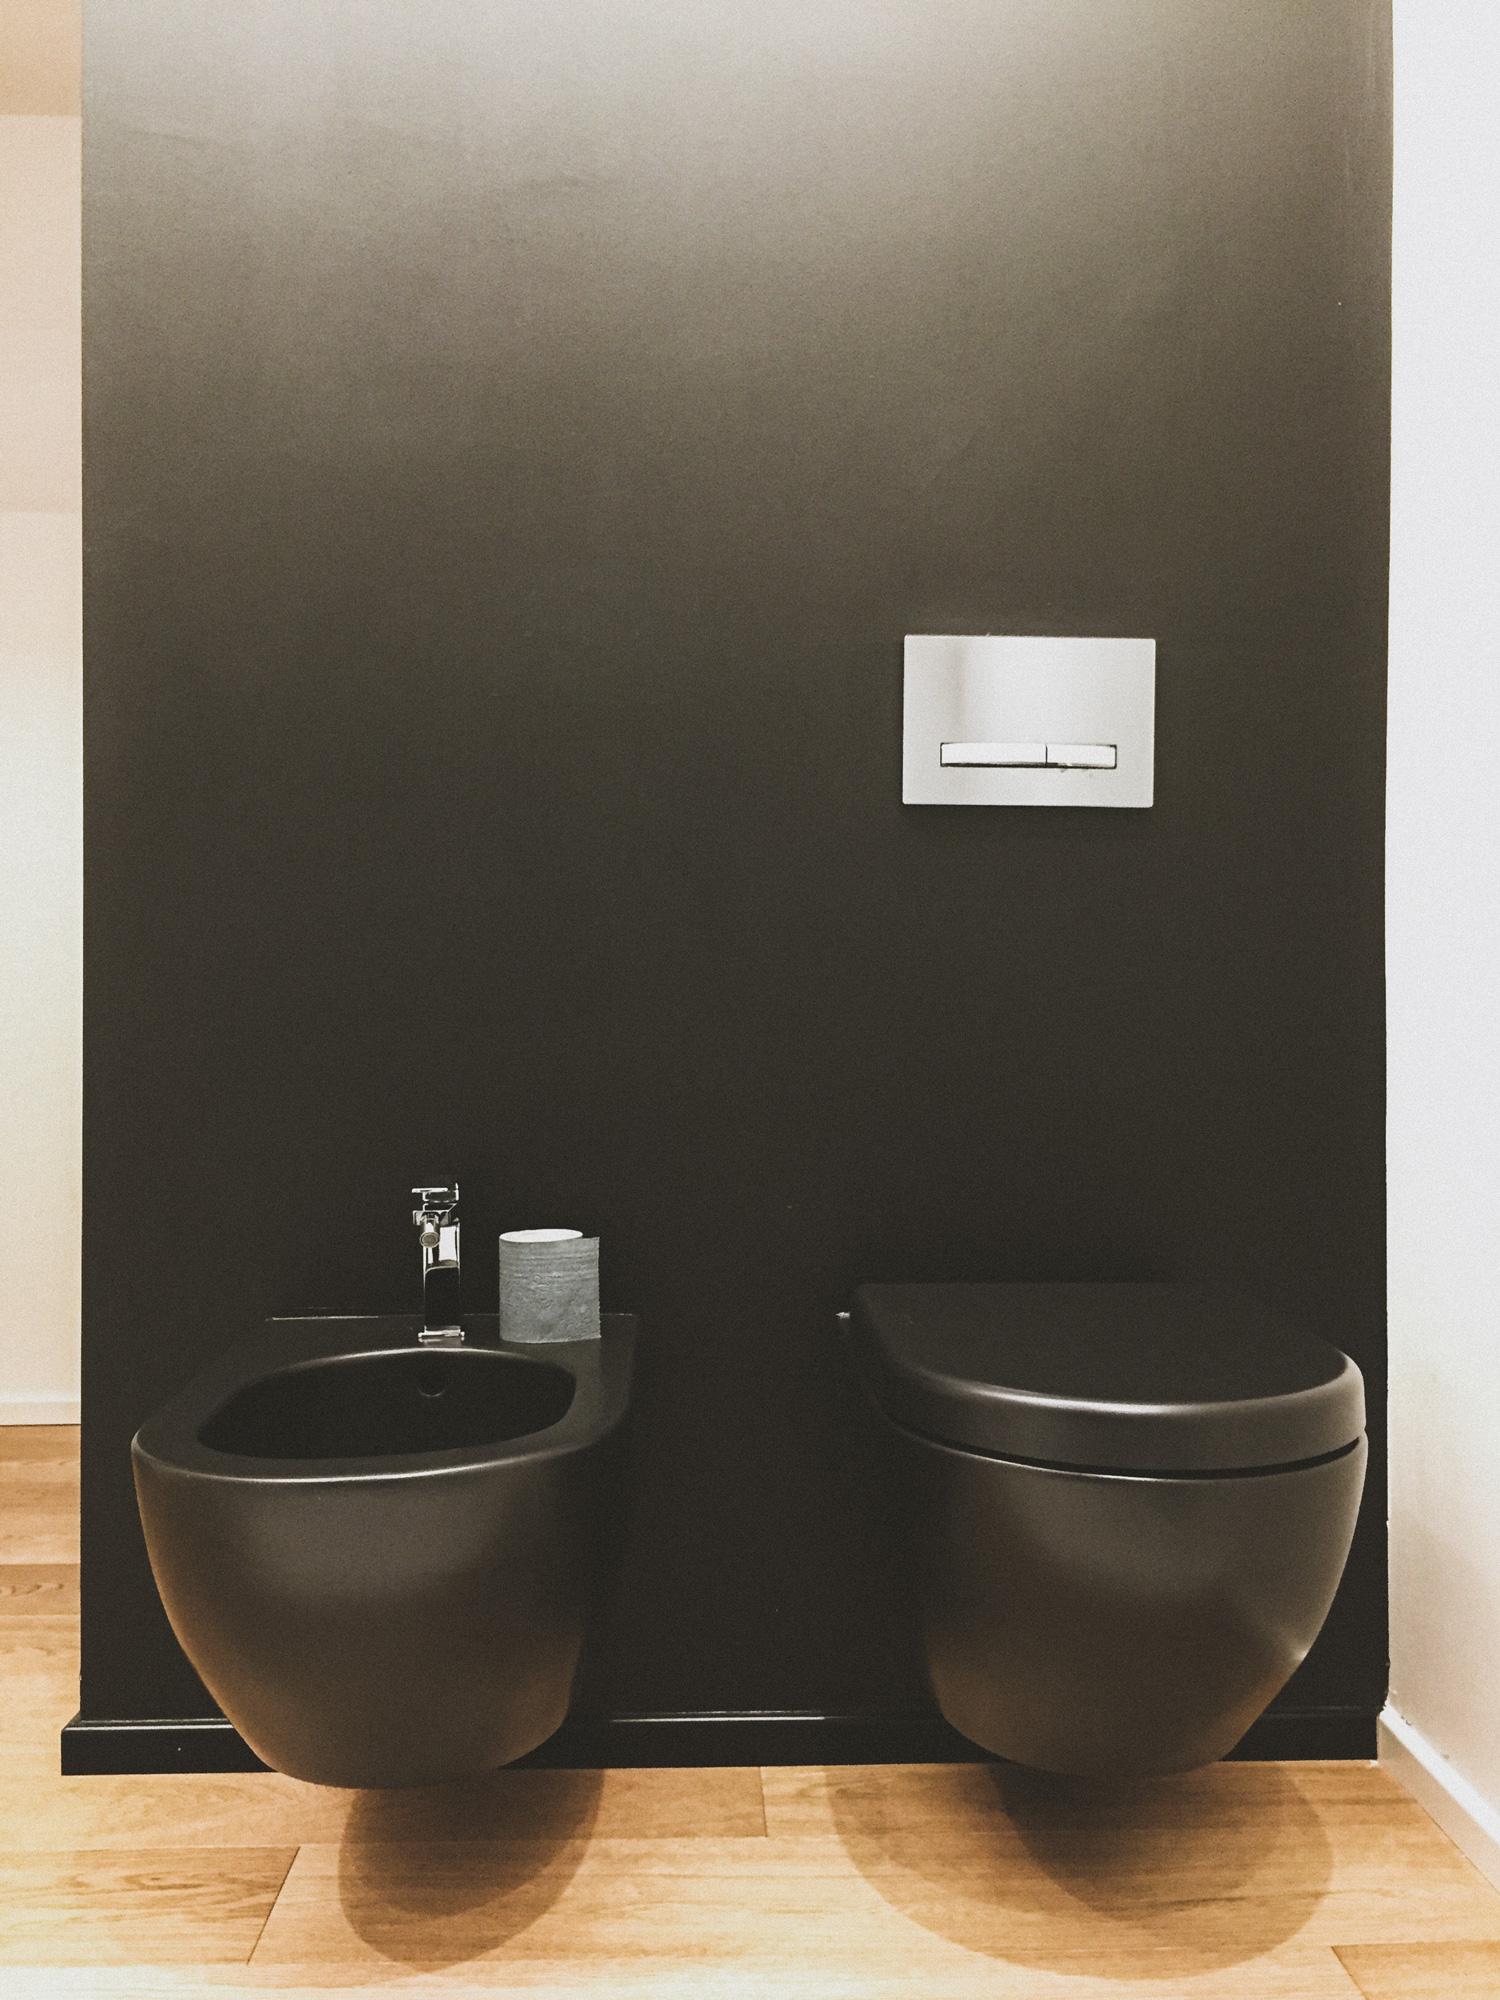 Bagno con sanitari neri